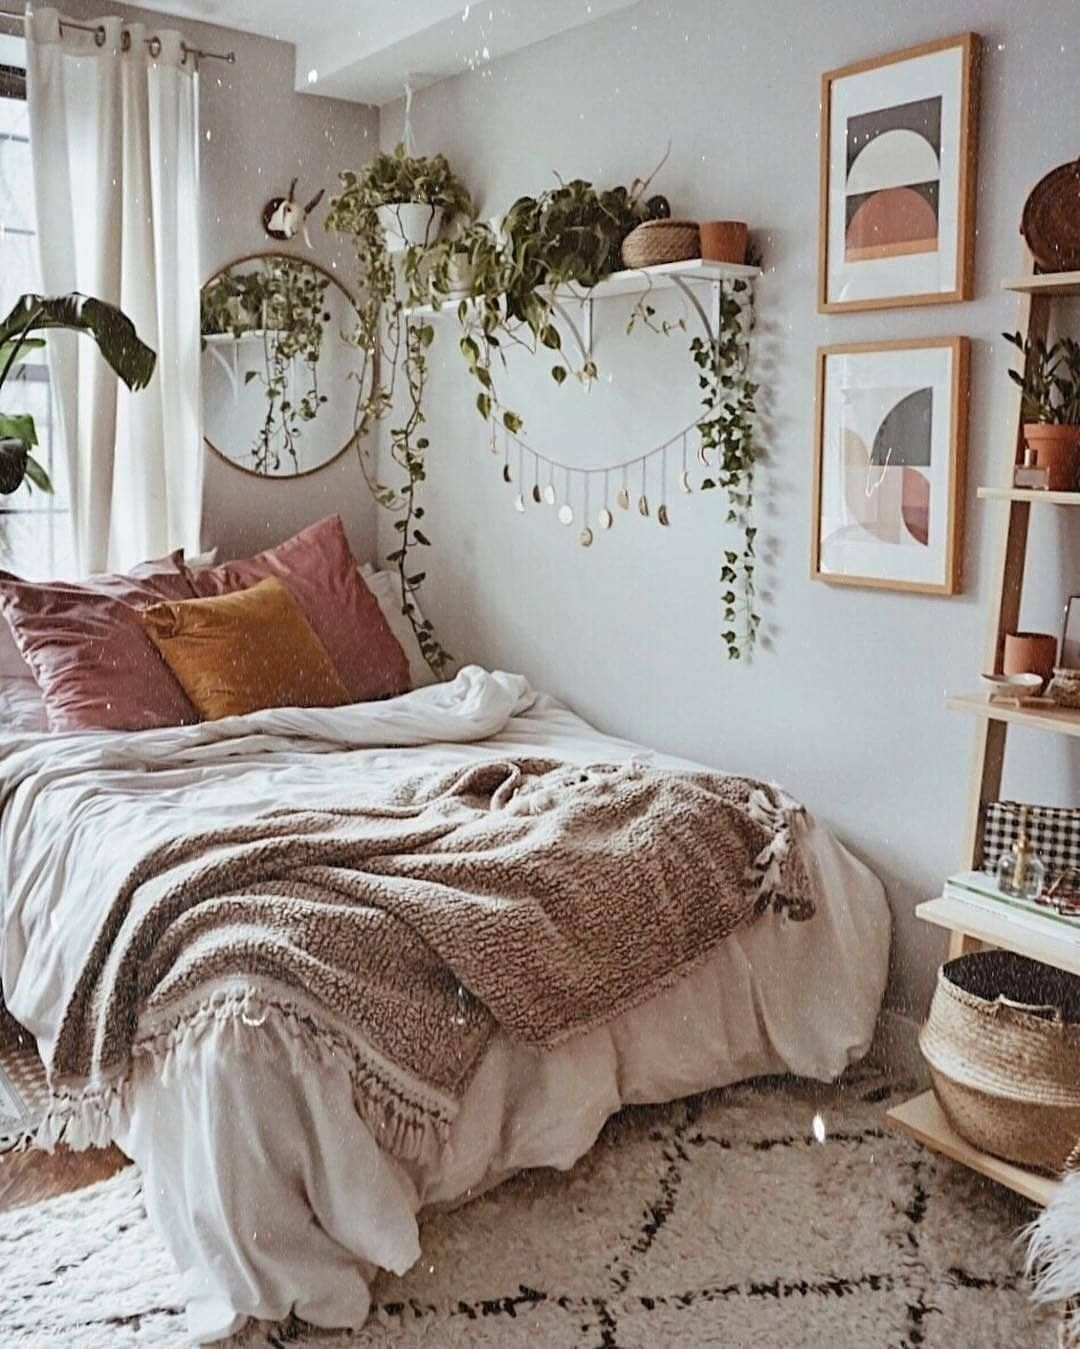 Bohemian Style Ideas For Bedroom Decor #bohemianbedrooms